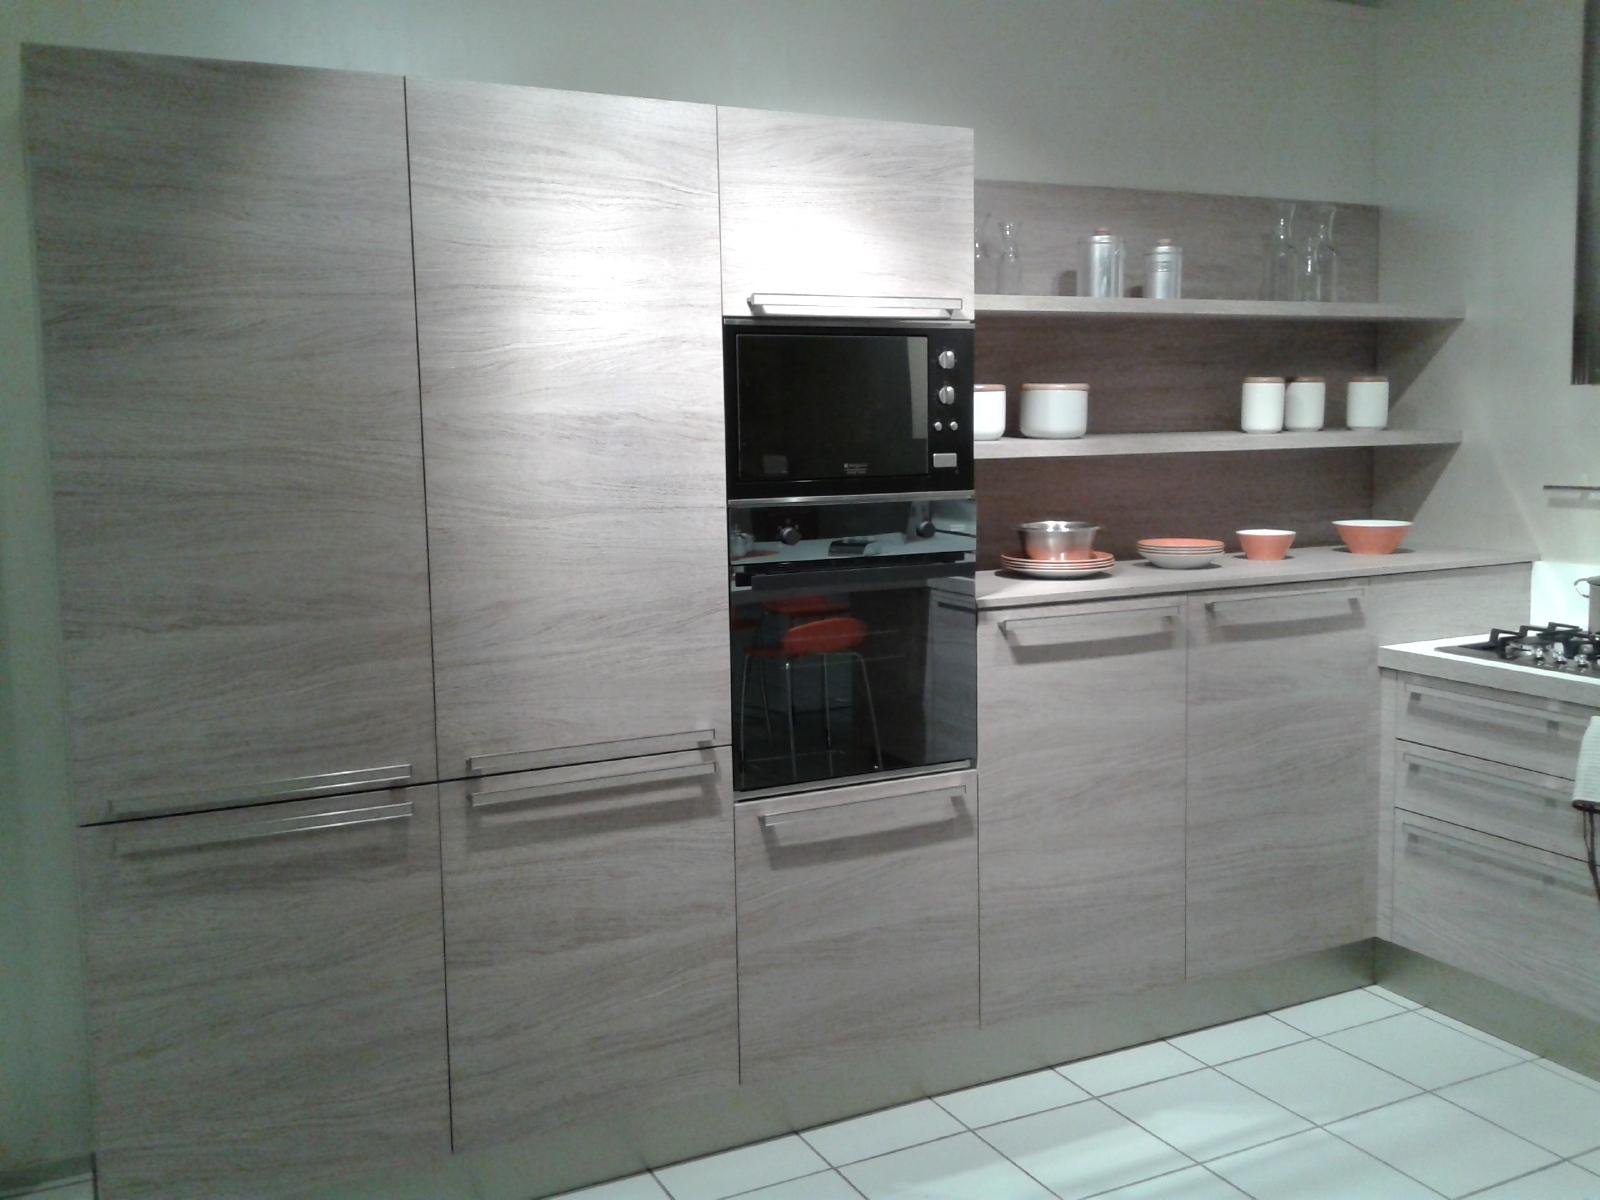 Cucina Veneta Cucine Ethica Decorativo Laminato Materico Cucine A  #785B53 1600 1200 Veneta Cucine è Una Buona Marca